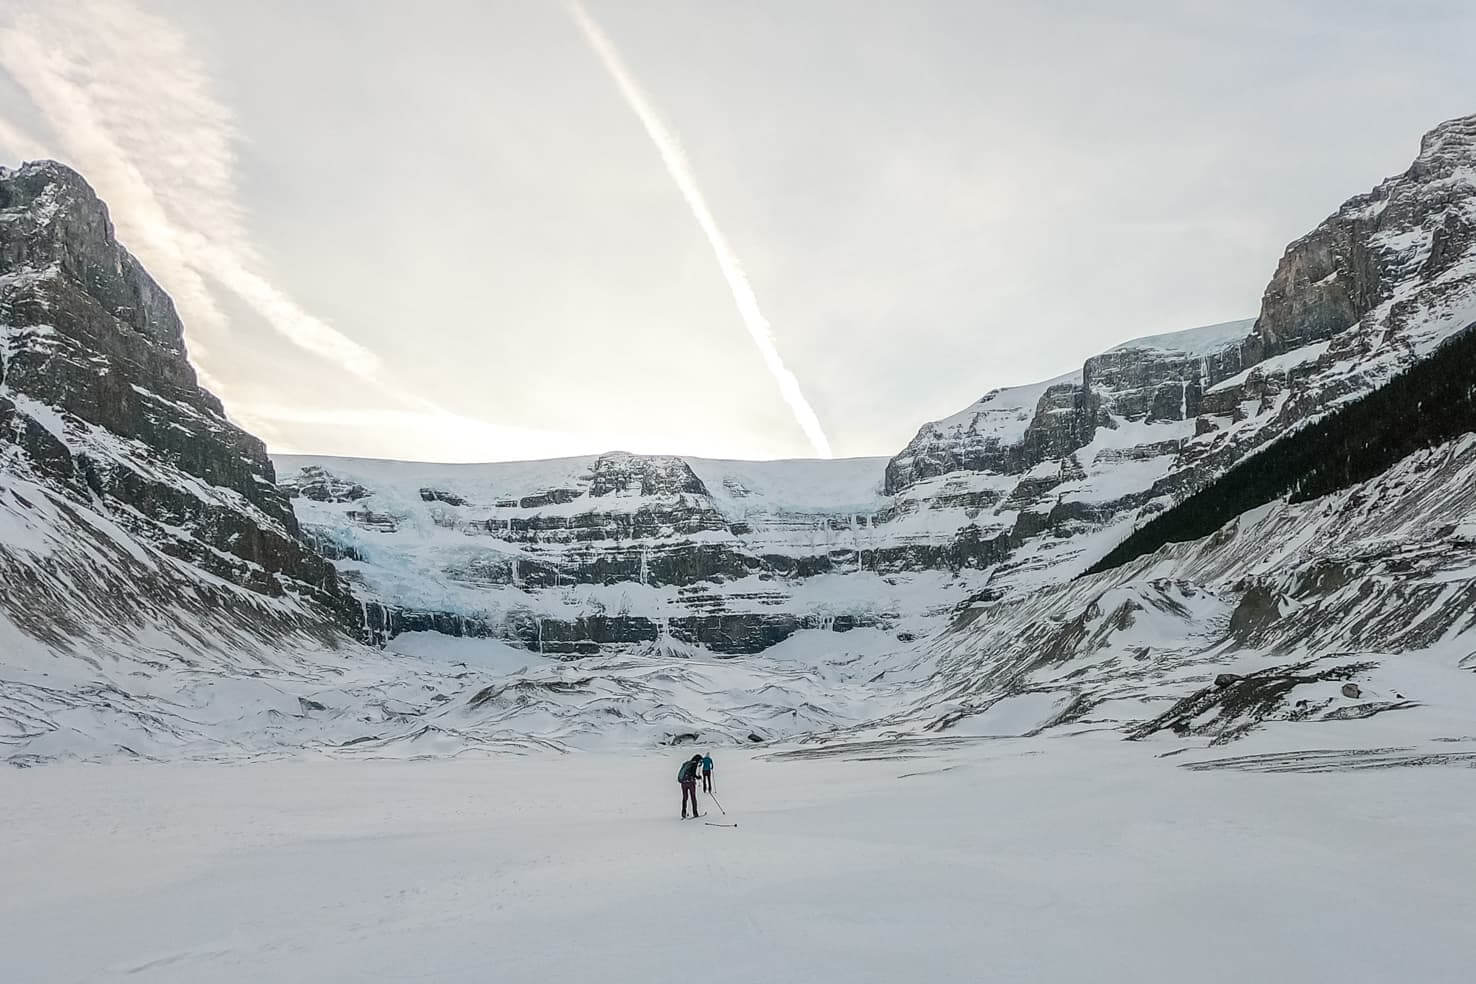 Cross country ski trails in Jasper National Park - Stutfield Glacier